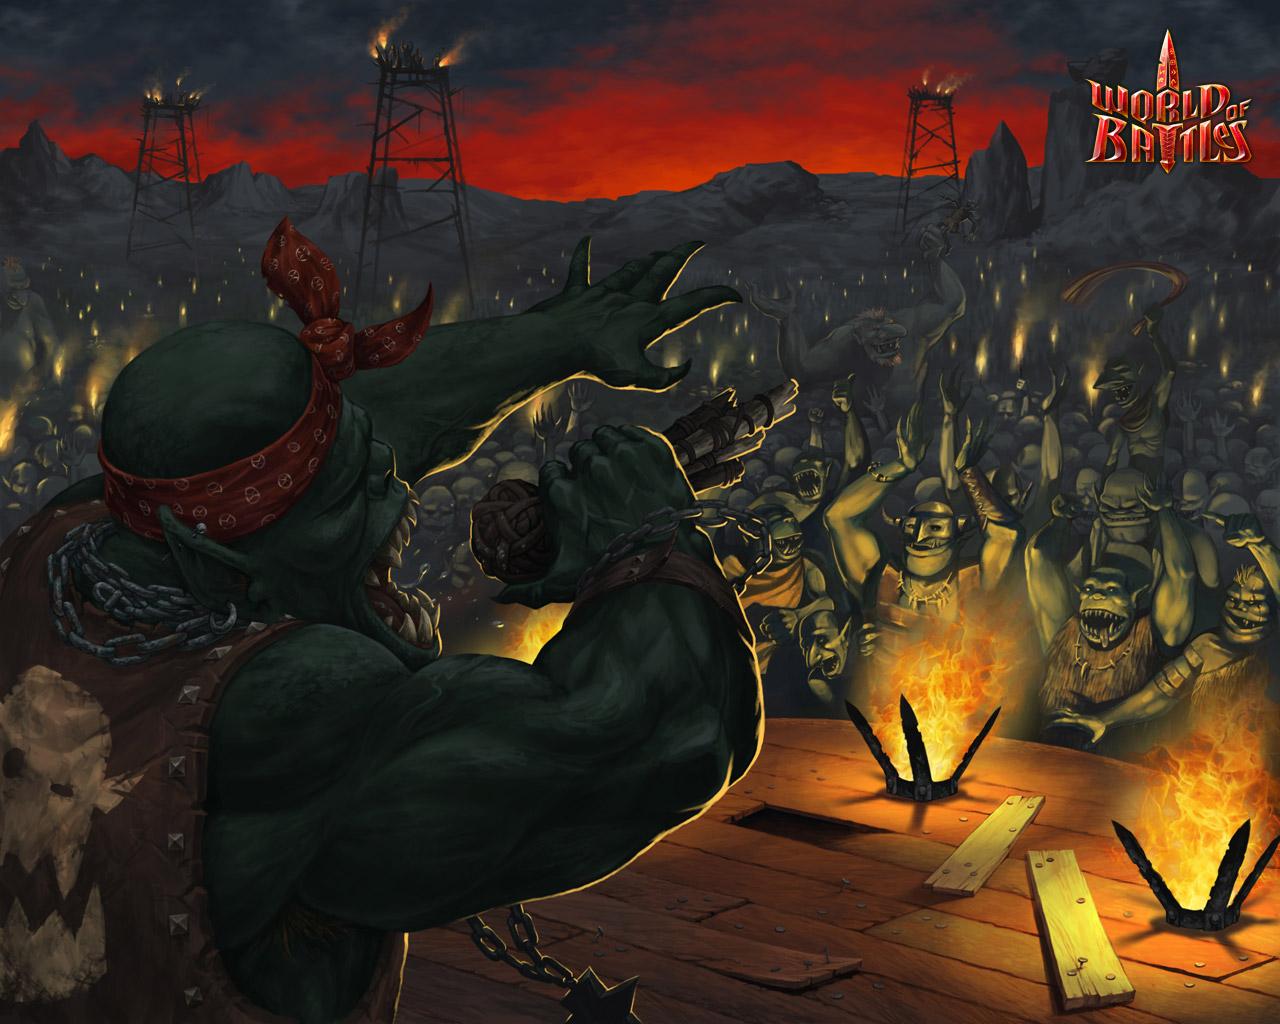 10929d1312593872 orc world battles wallpaper orc wallpaper orcjpg 1280x1024